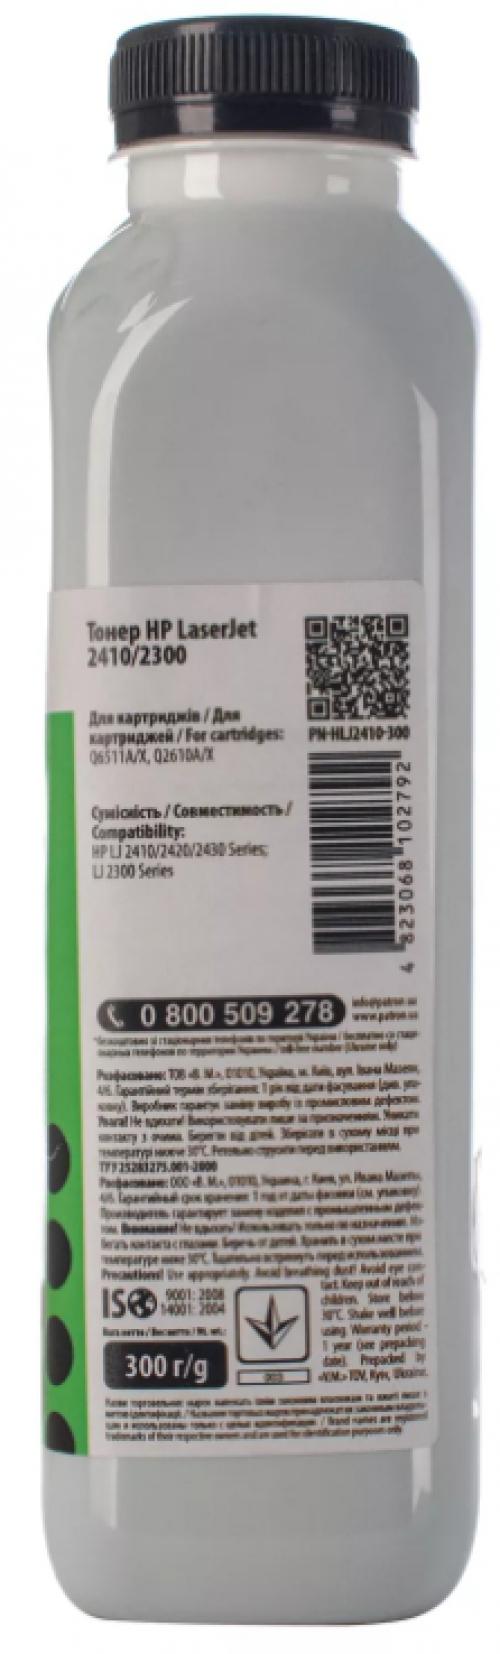 (Уценка)Тонер HP LJ 2410/2420/30 (фл 300 г.) SC